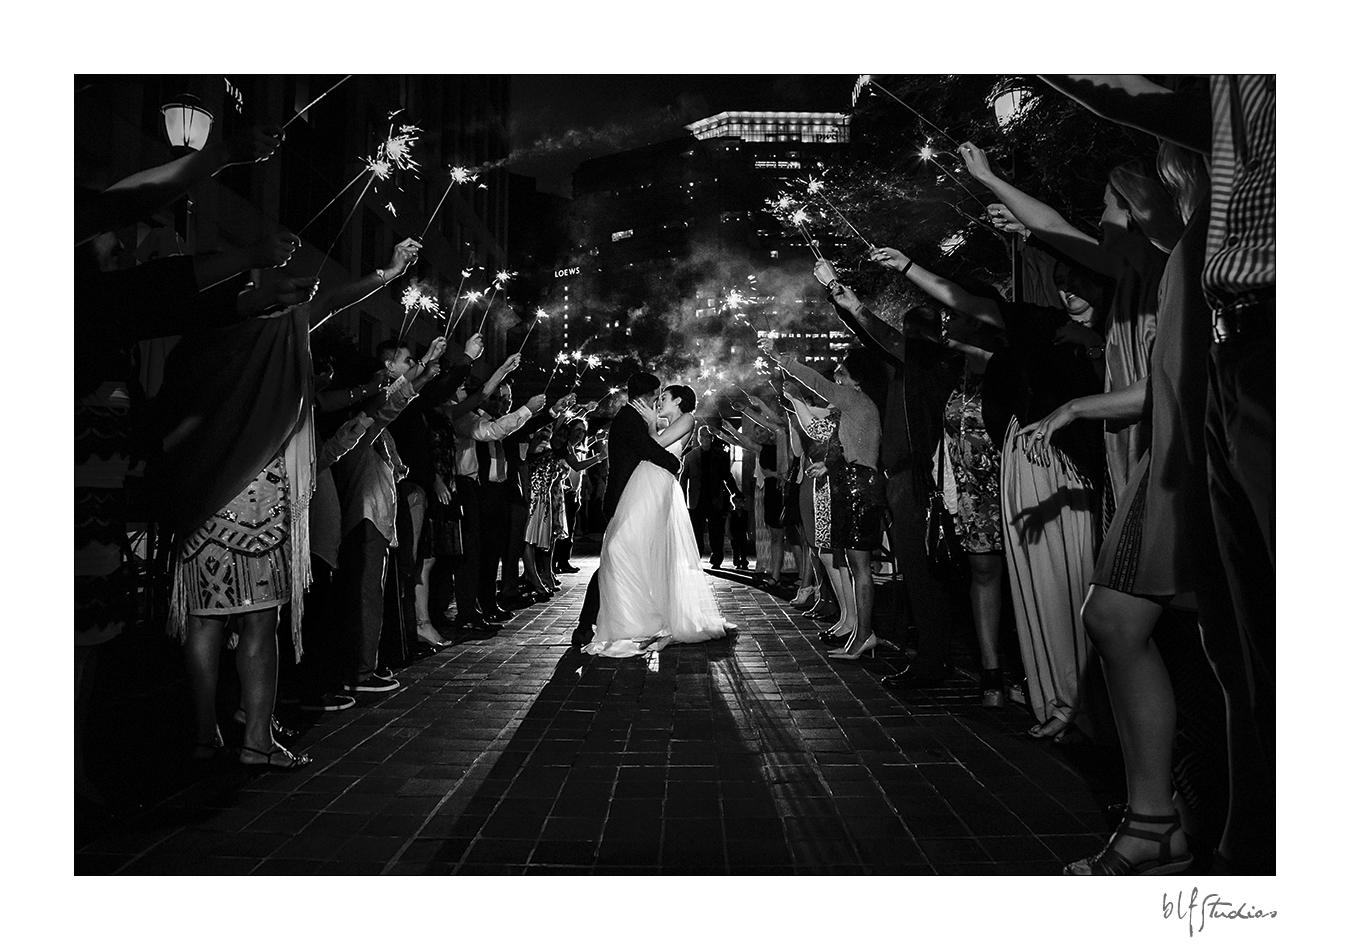 0053-blfstudios-wedding-photographer-daniel-danielle-atlanta.jpg